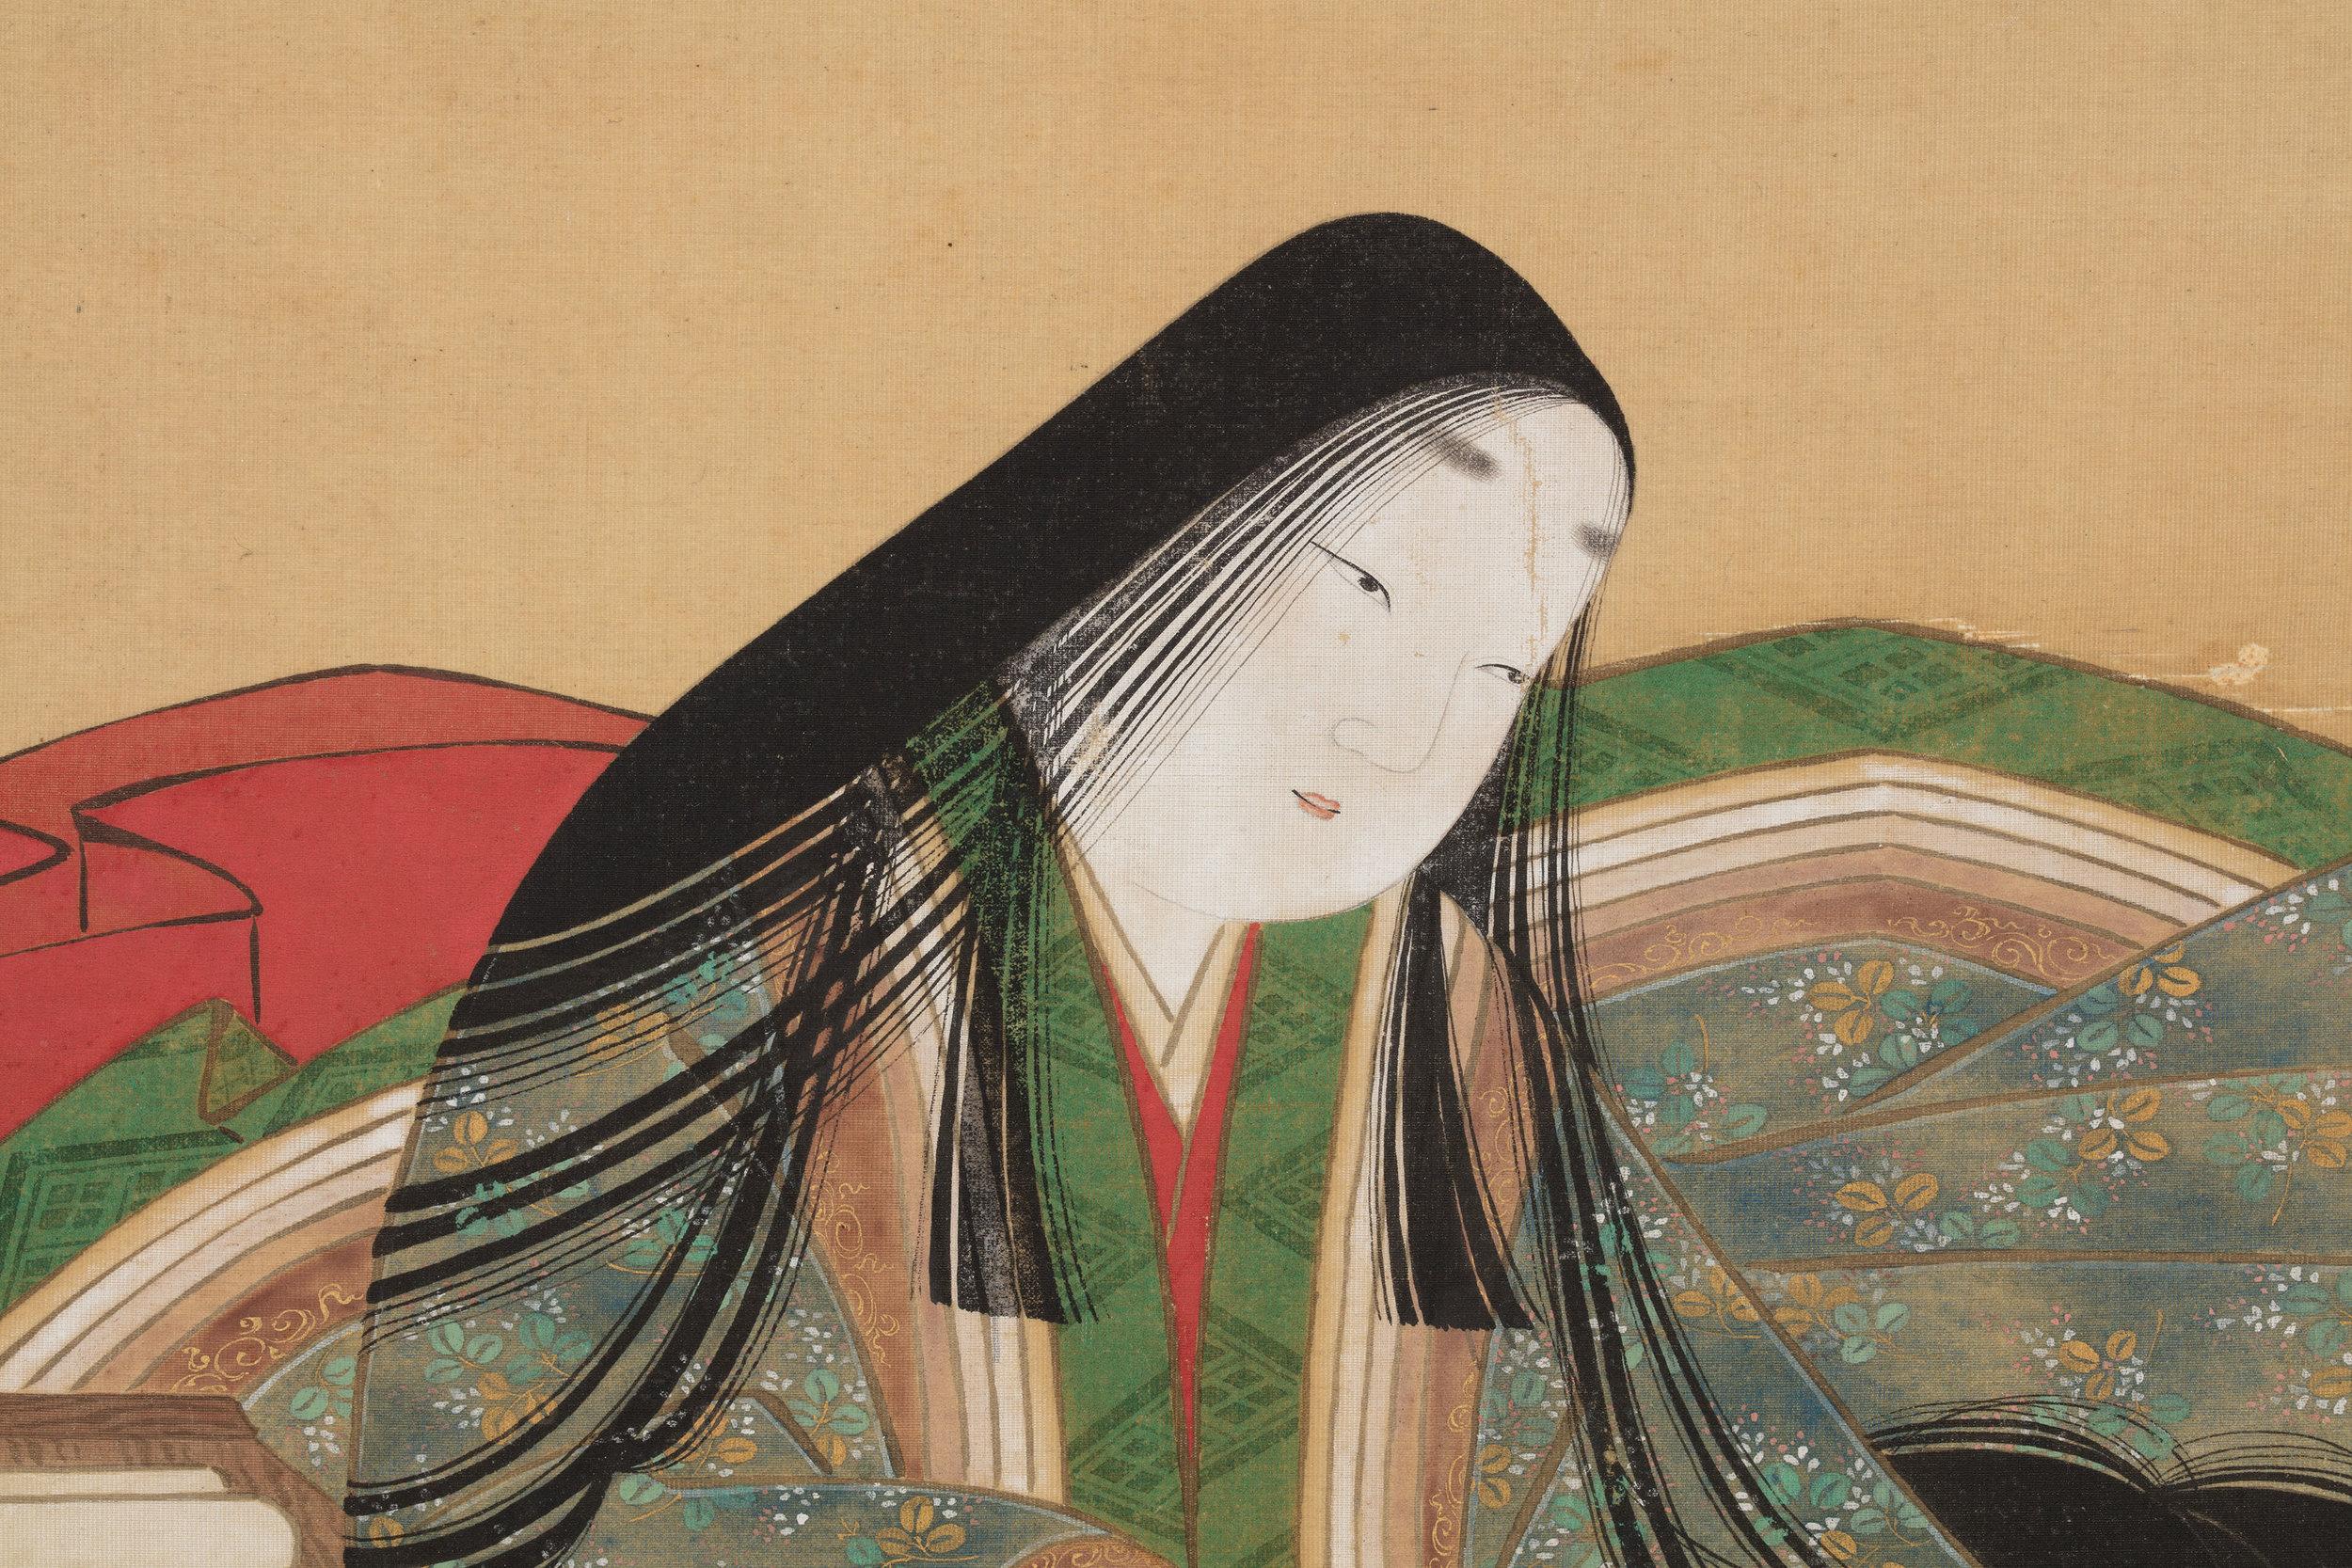 Tosa Mitsuoki, Japanese, 1617–1691 Murasaki Shikibu Composing The Tale of Genji (detail) Japan, Edo period (1615–1868), 17th century Hanging scroll; ink and color on silk